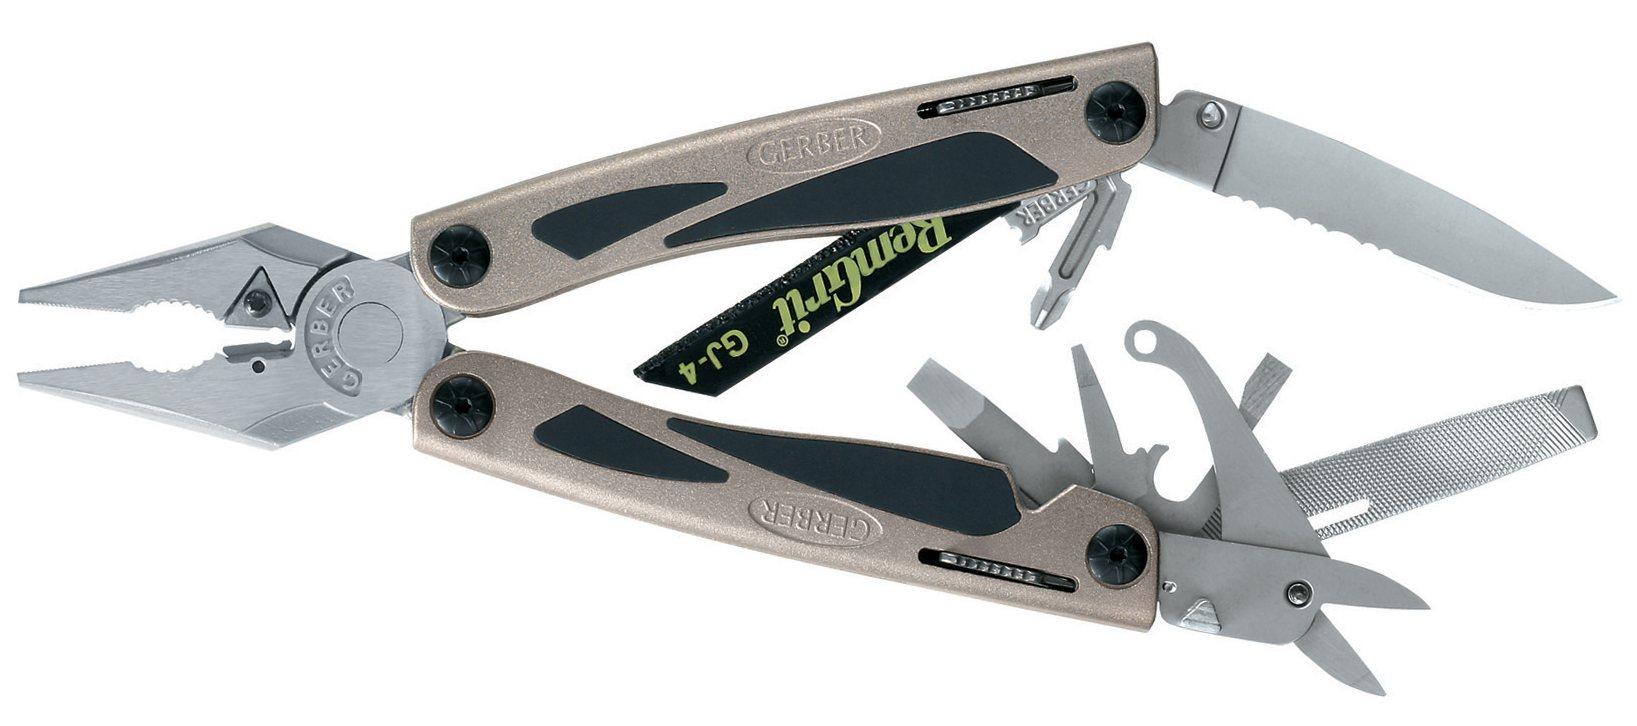 Needlenose pliers include zirconium nitride hard wire cutter insert